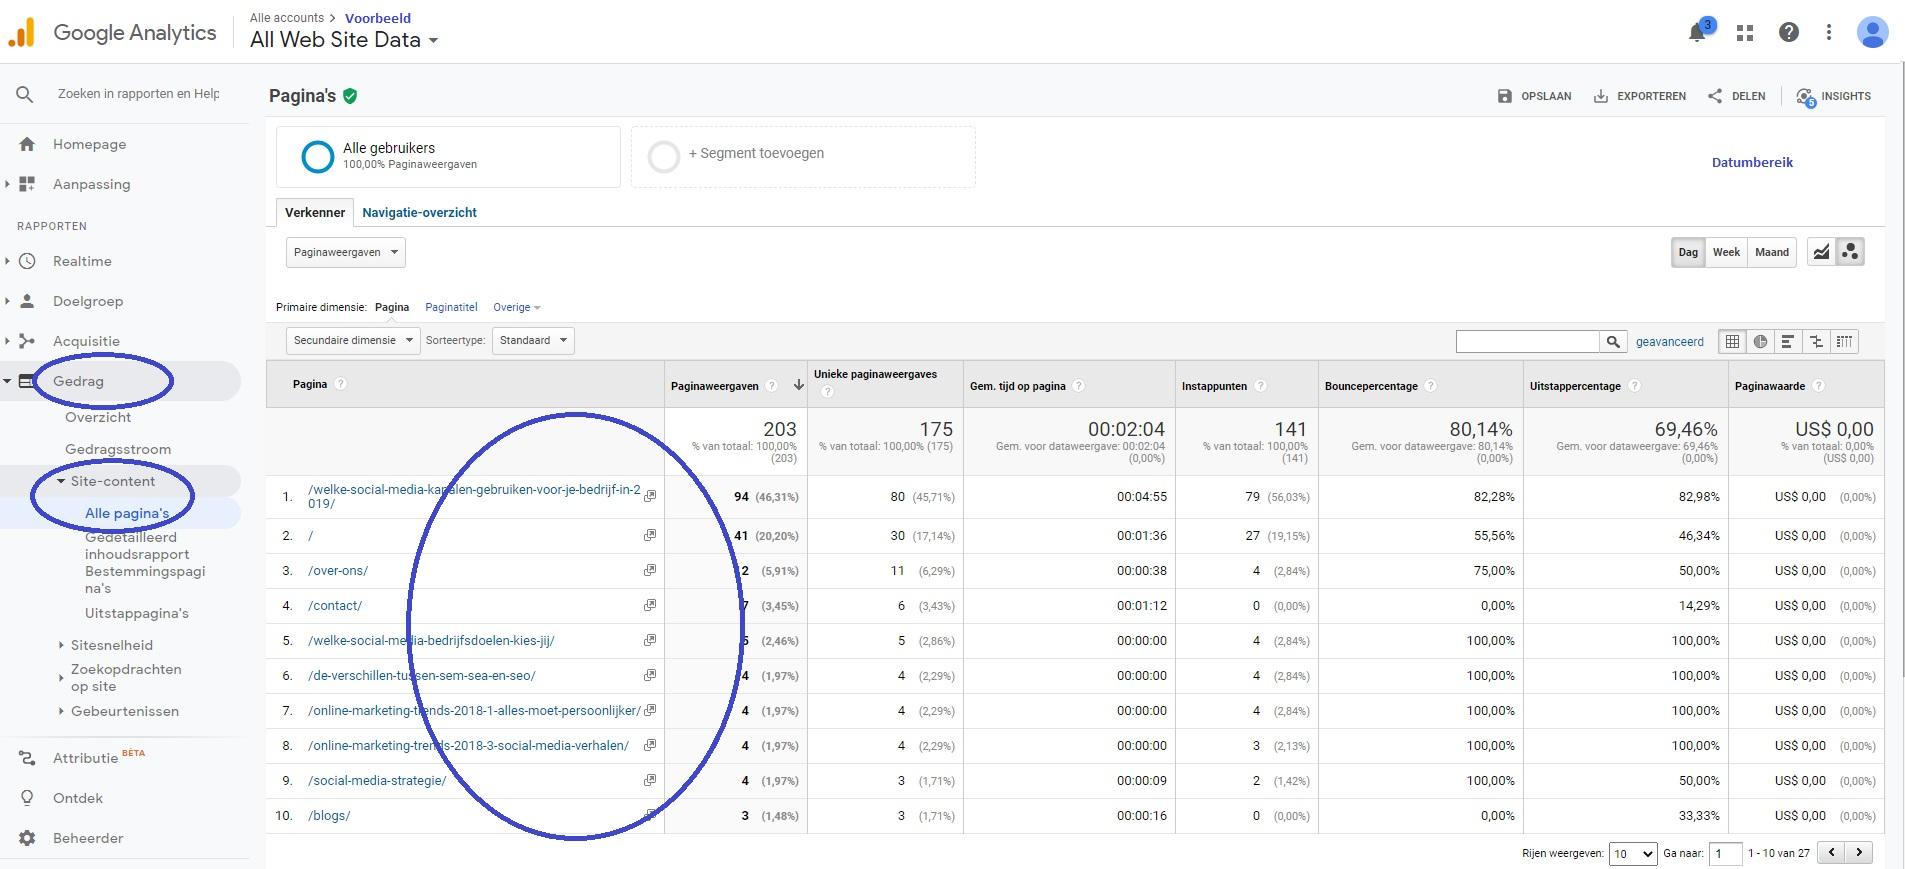 Screenshot Google Analytics overzicht gedrag - sitecontent